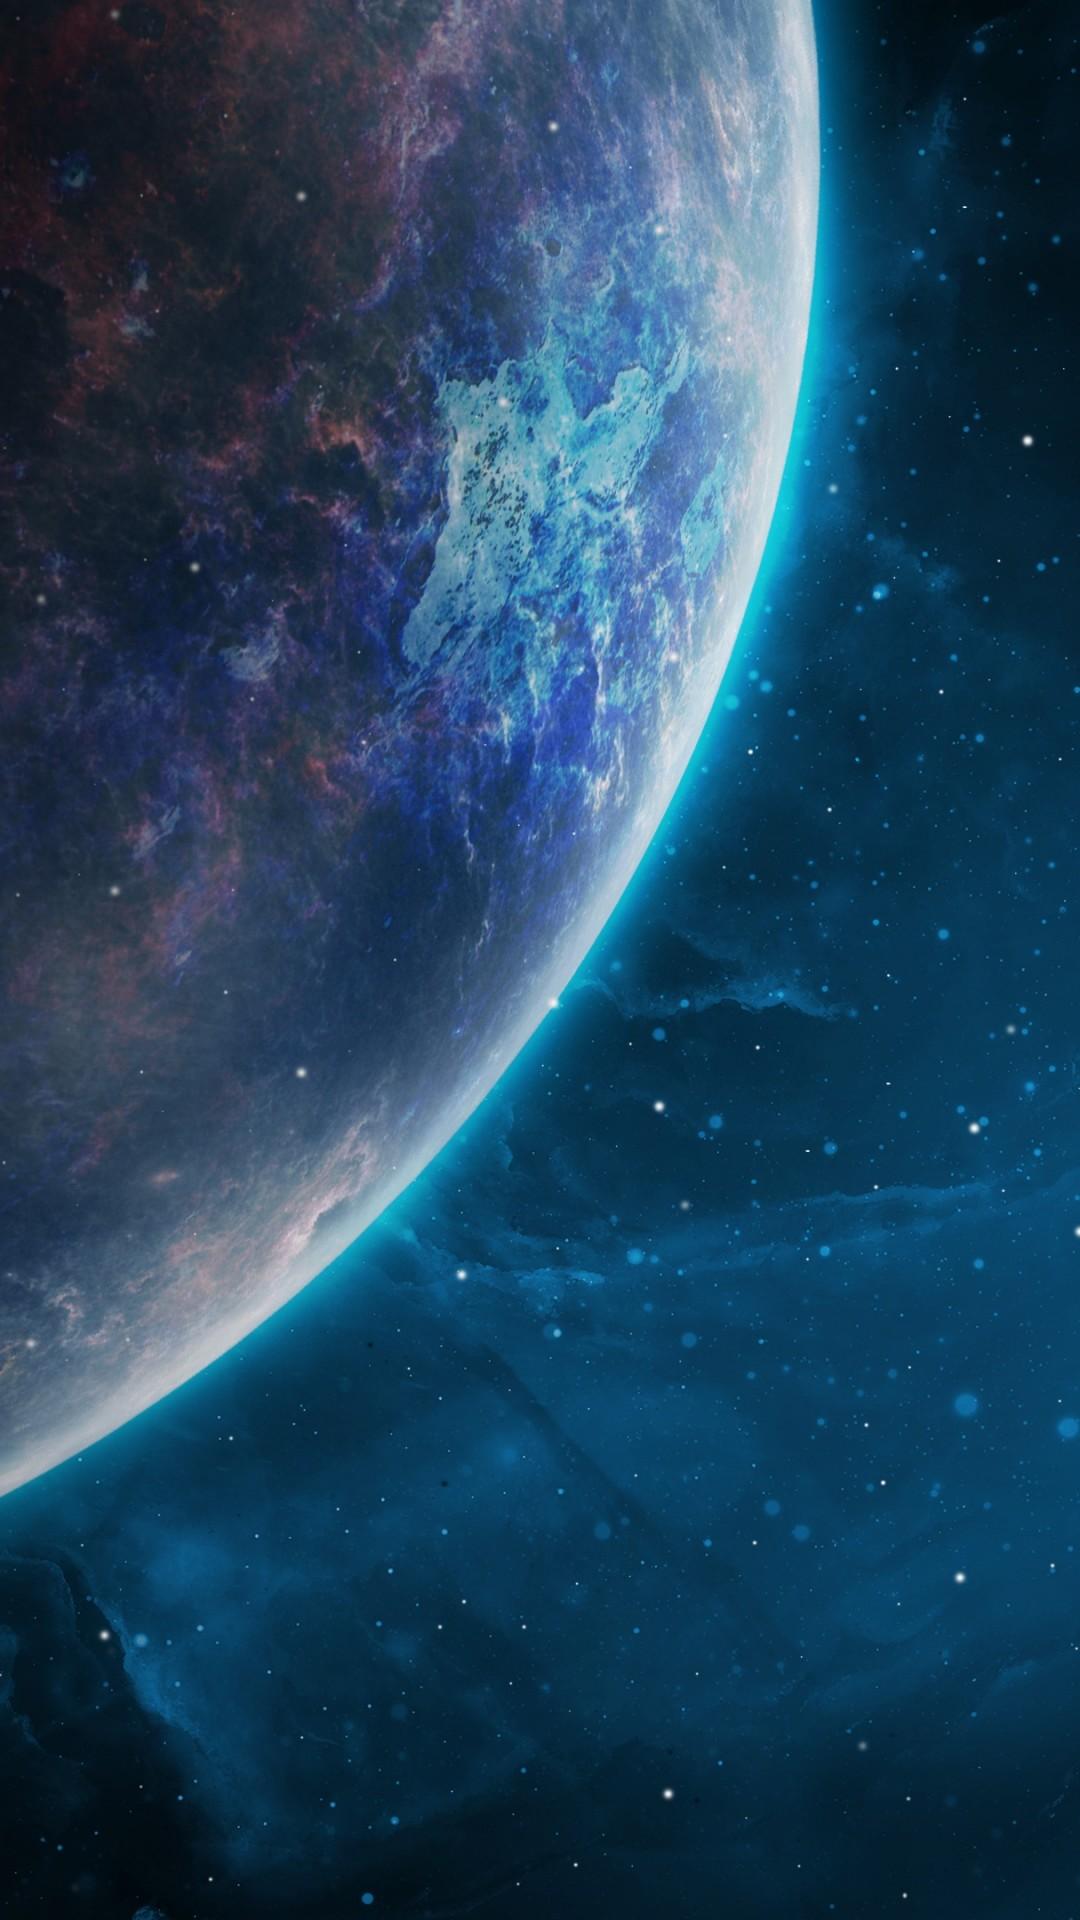 Wallpaper Space, Galaxy, Planet, 4k, Space #17039